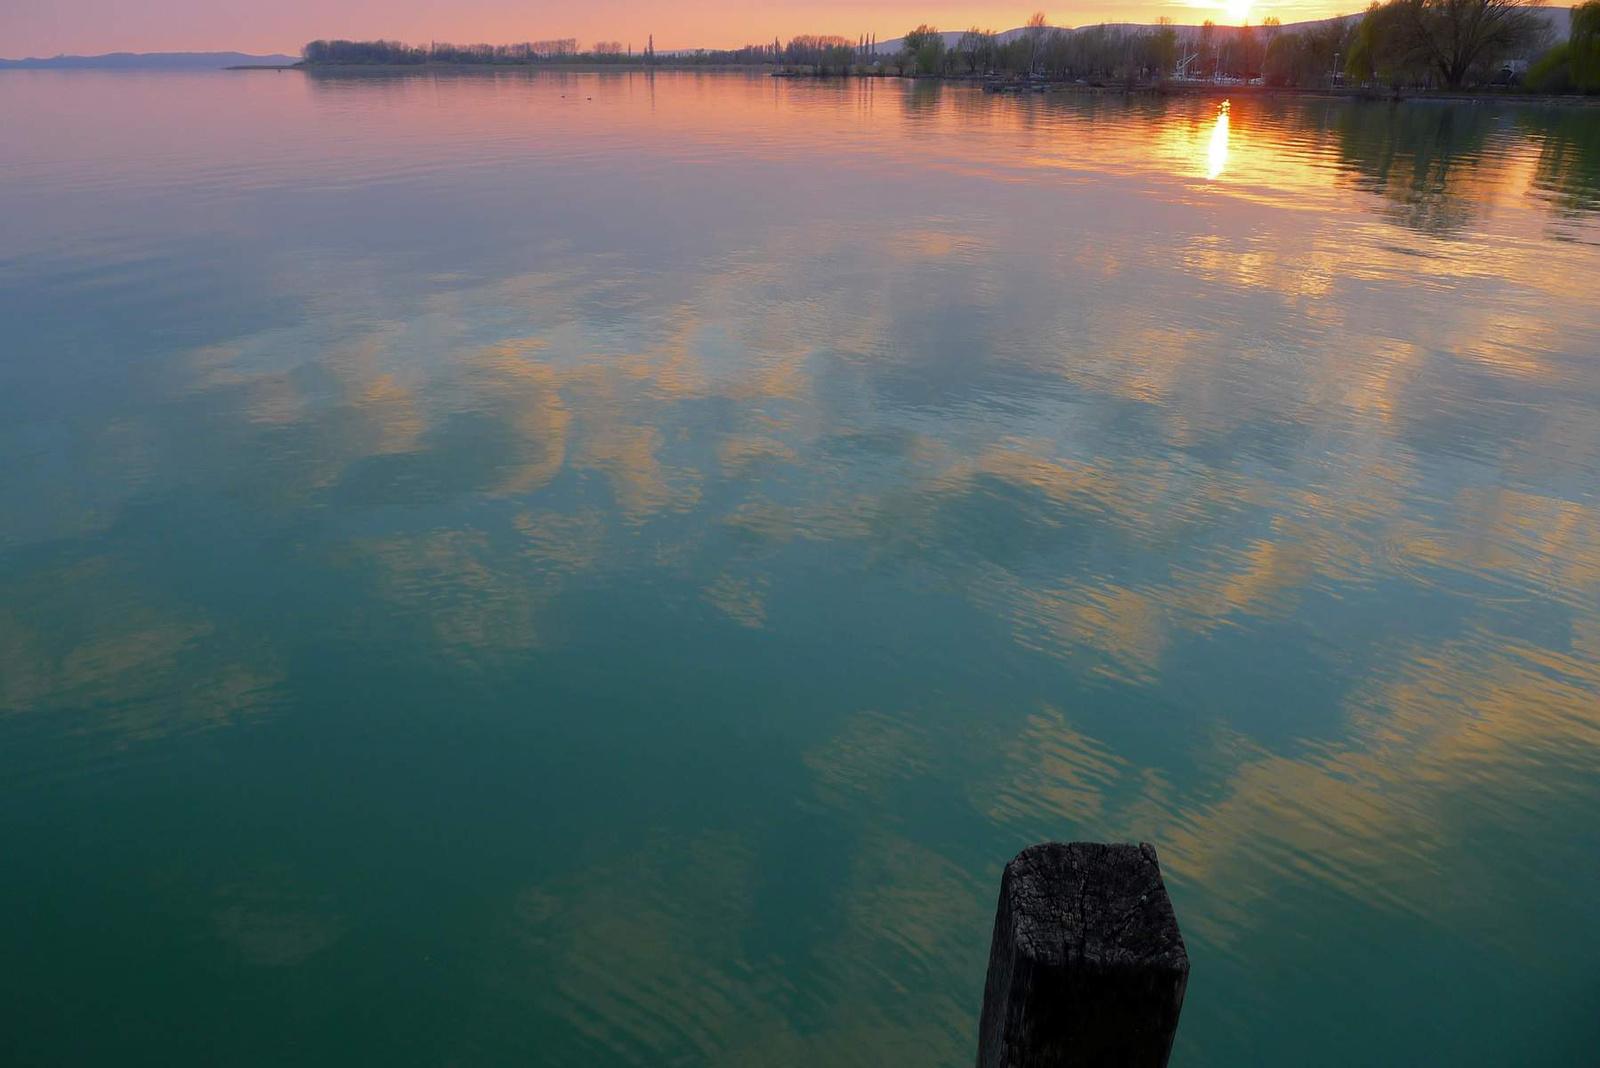 Vizi naplemente